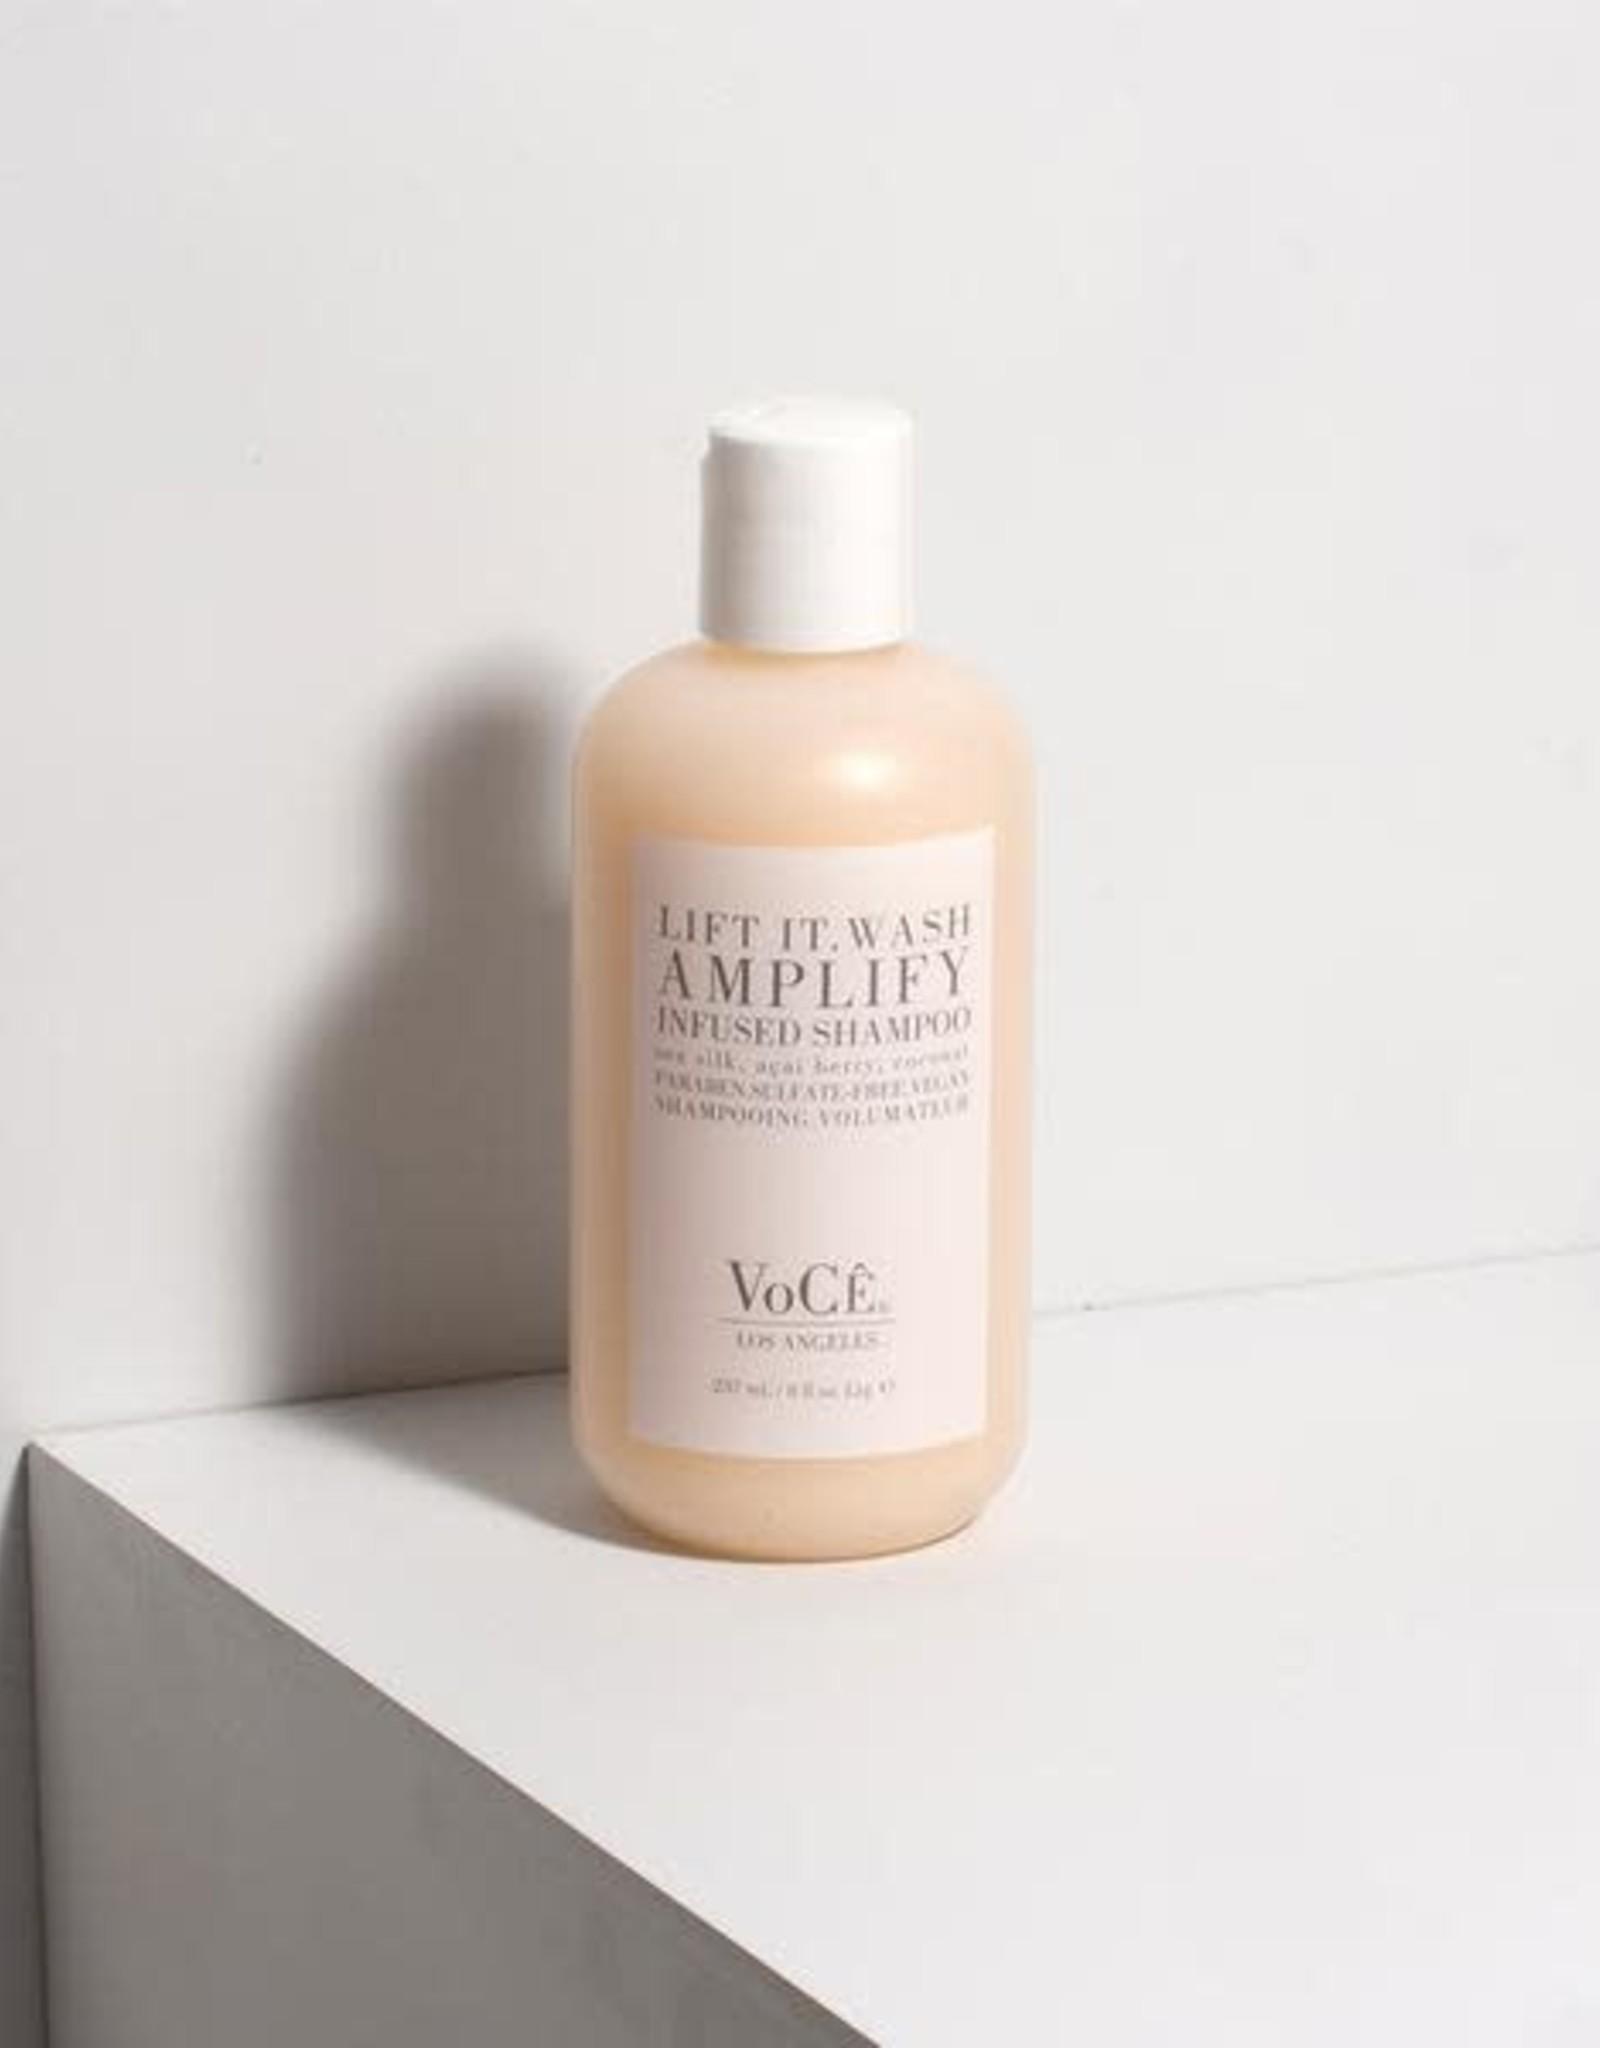 Voce Amplify Shampoo